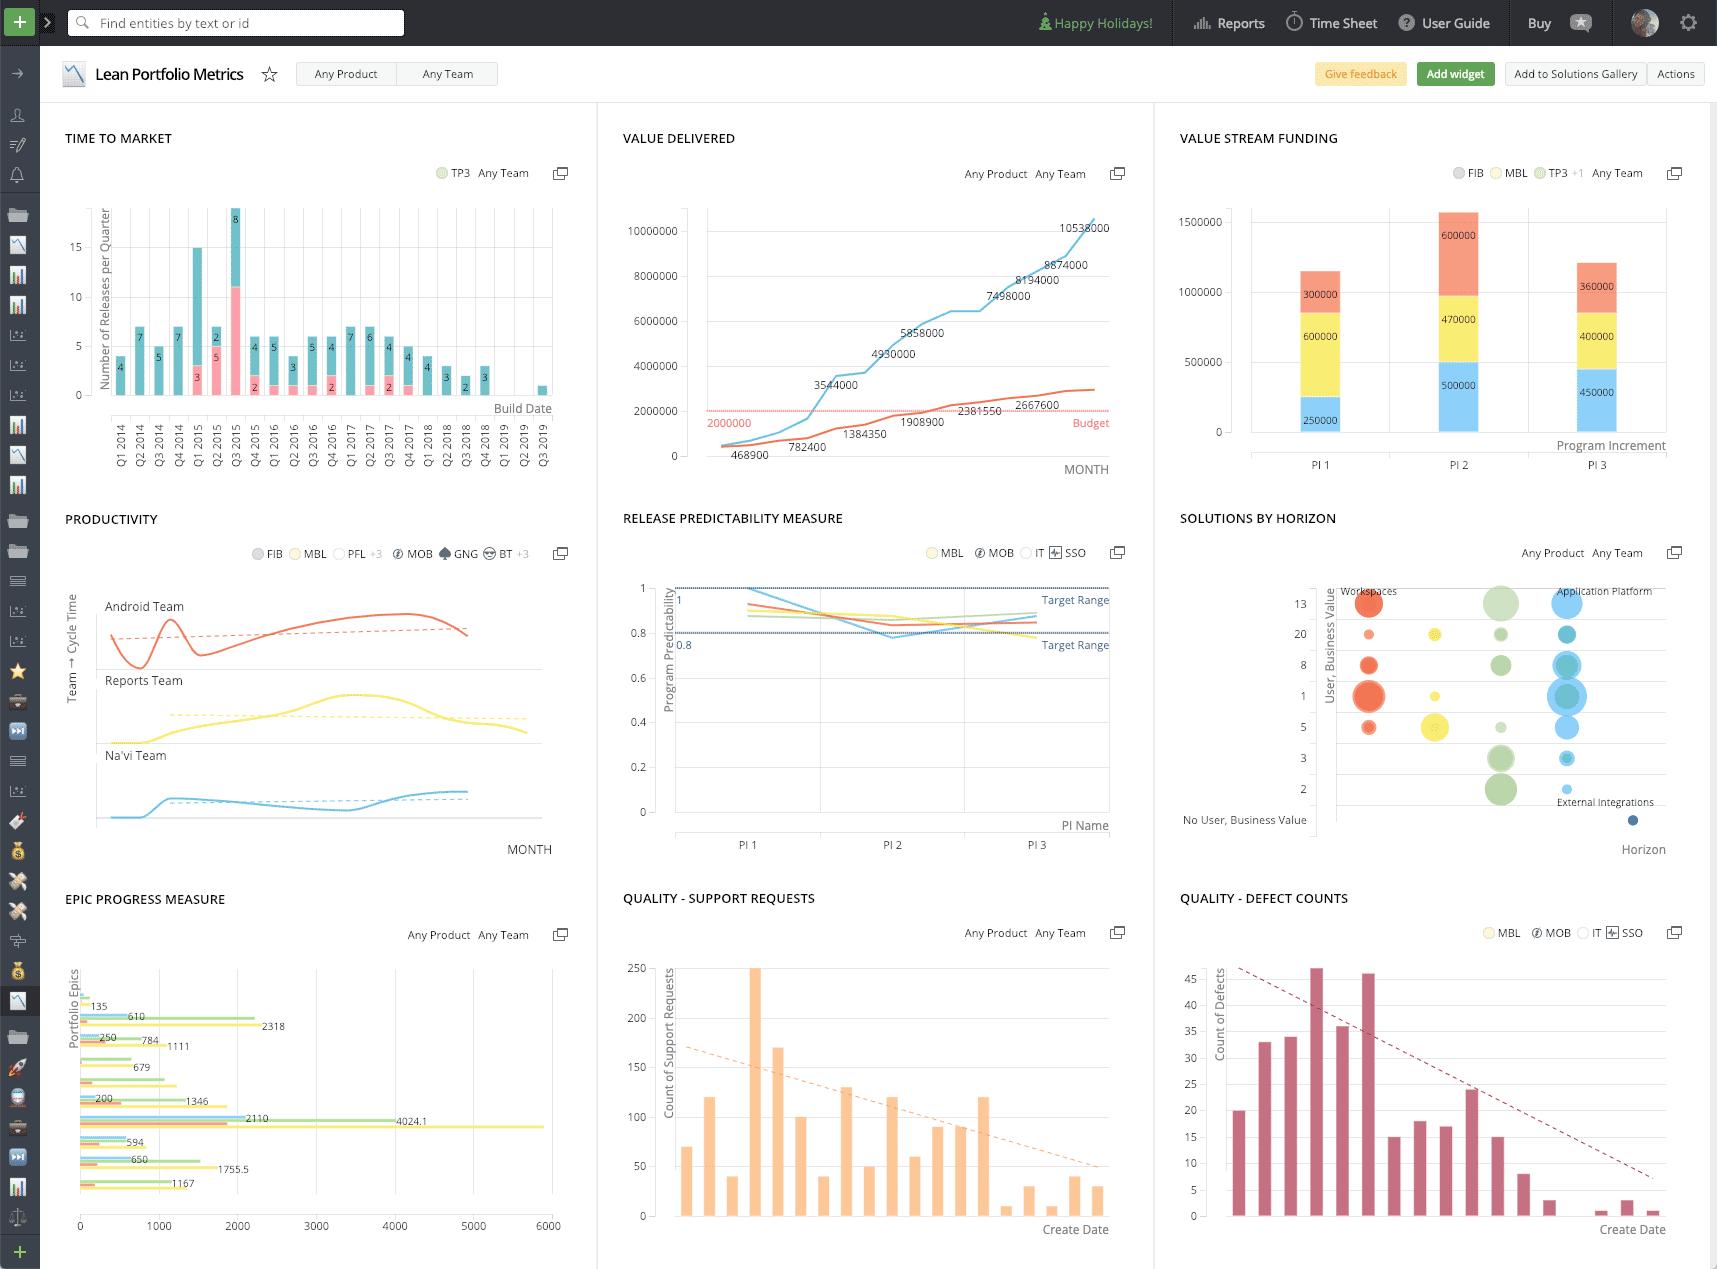 Targetprocess Software - Targetprocess lean portfolio metrics